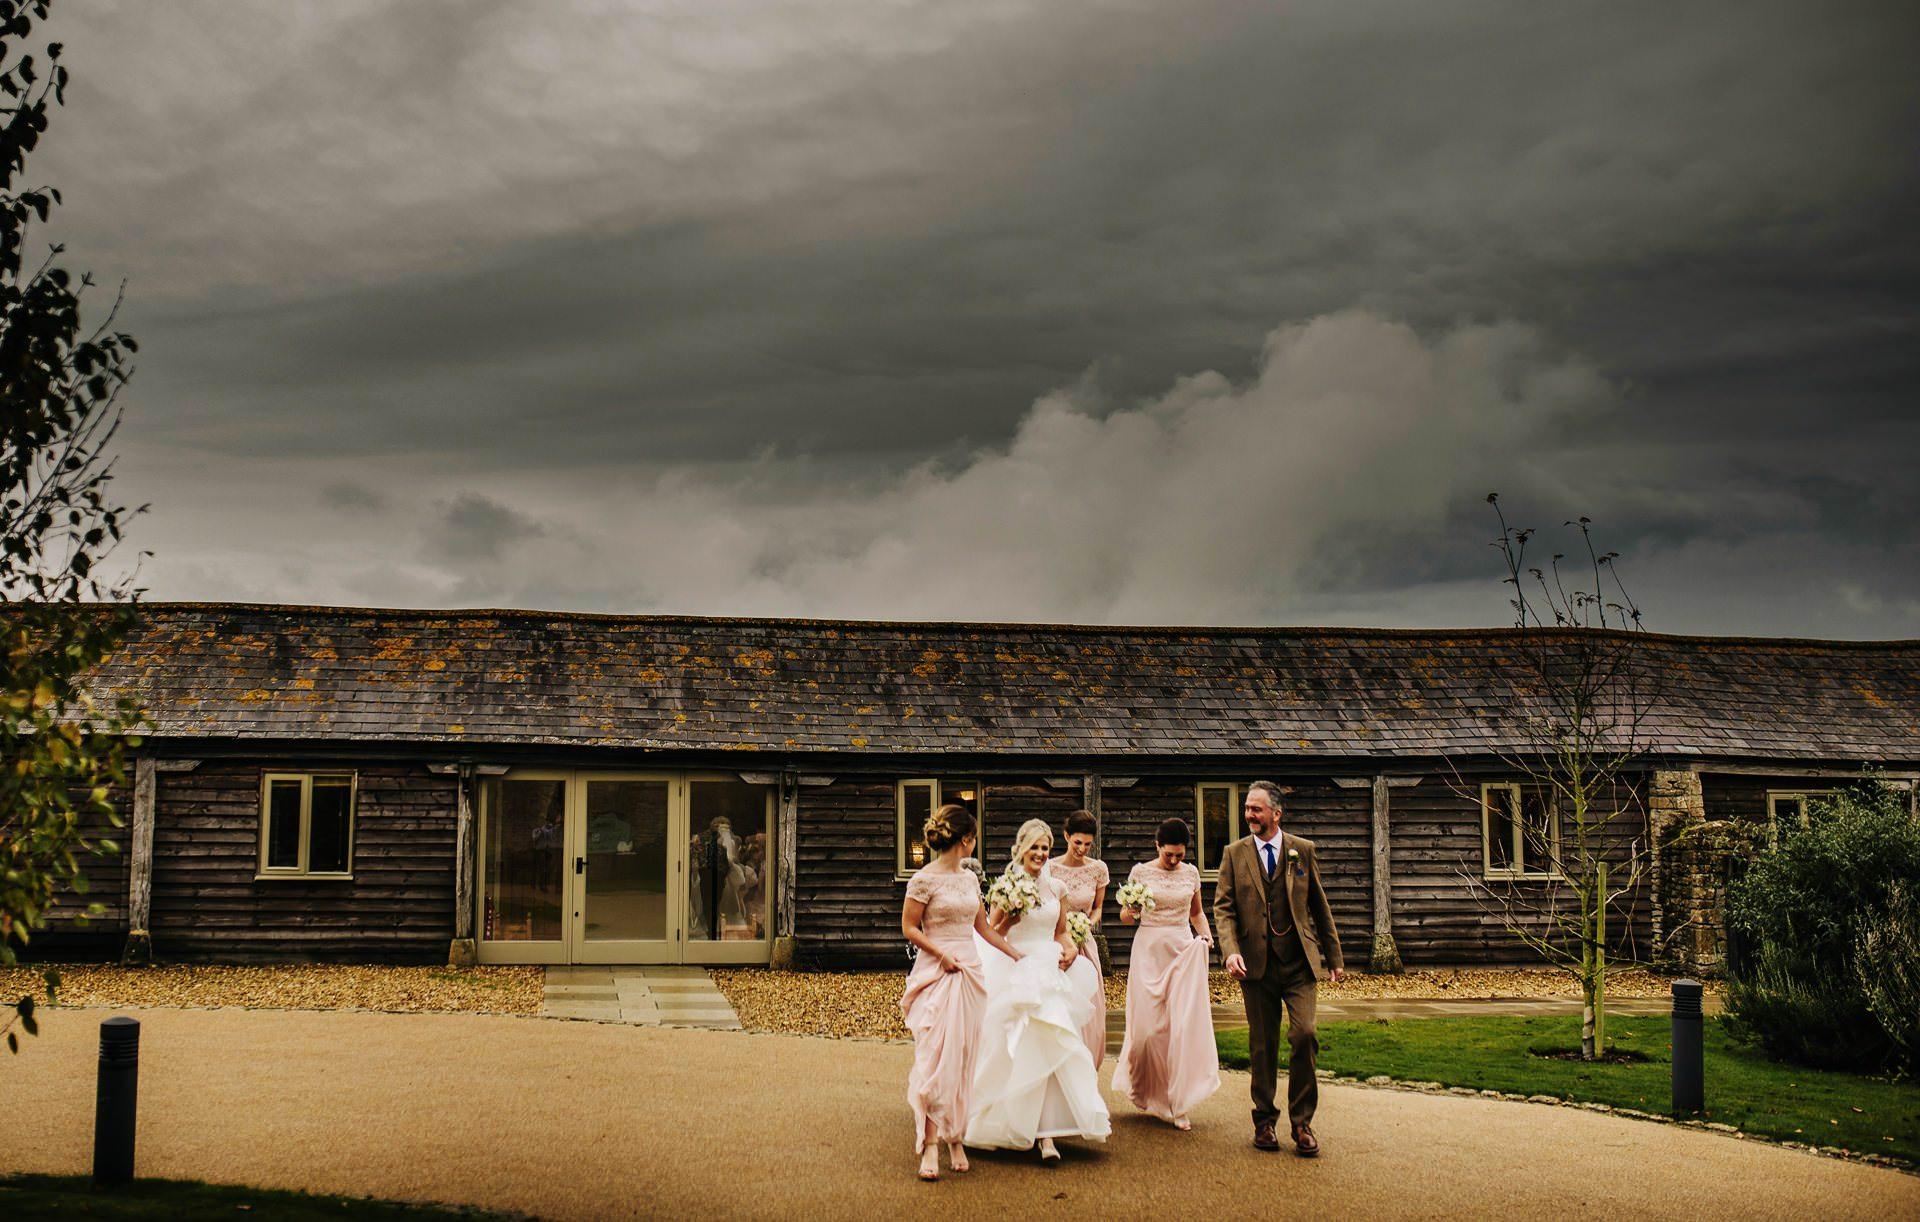 Caswell House Wedding Photographer - Jessica & Chris 1